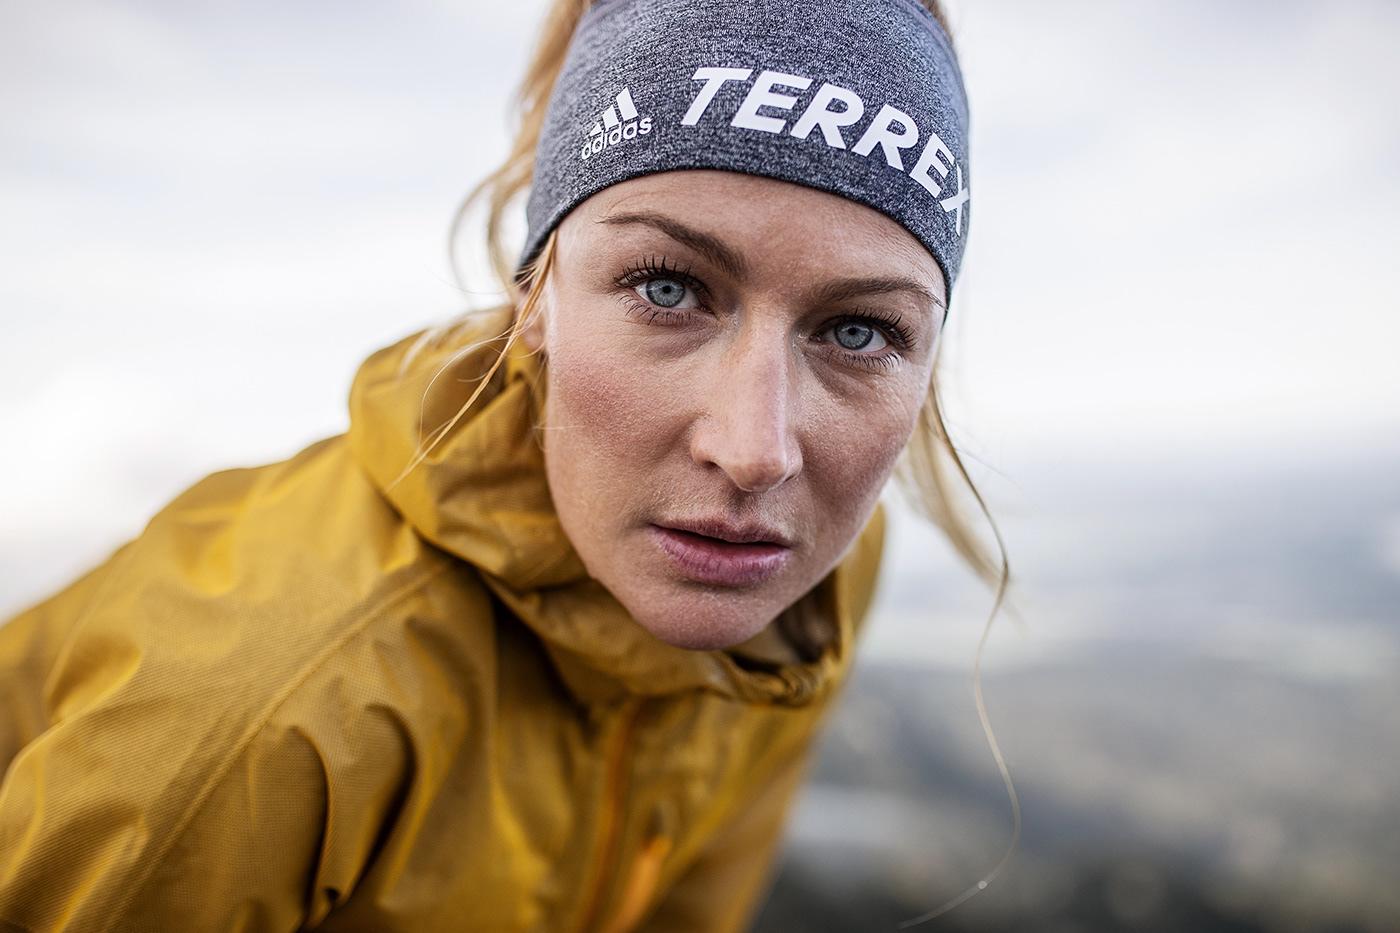 fotograf-sport-zuerich-zalando-adidas-terrex-produktion-trailrunning-commercial-helgeroeske-behance3